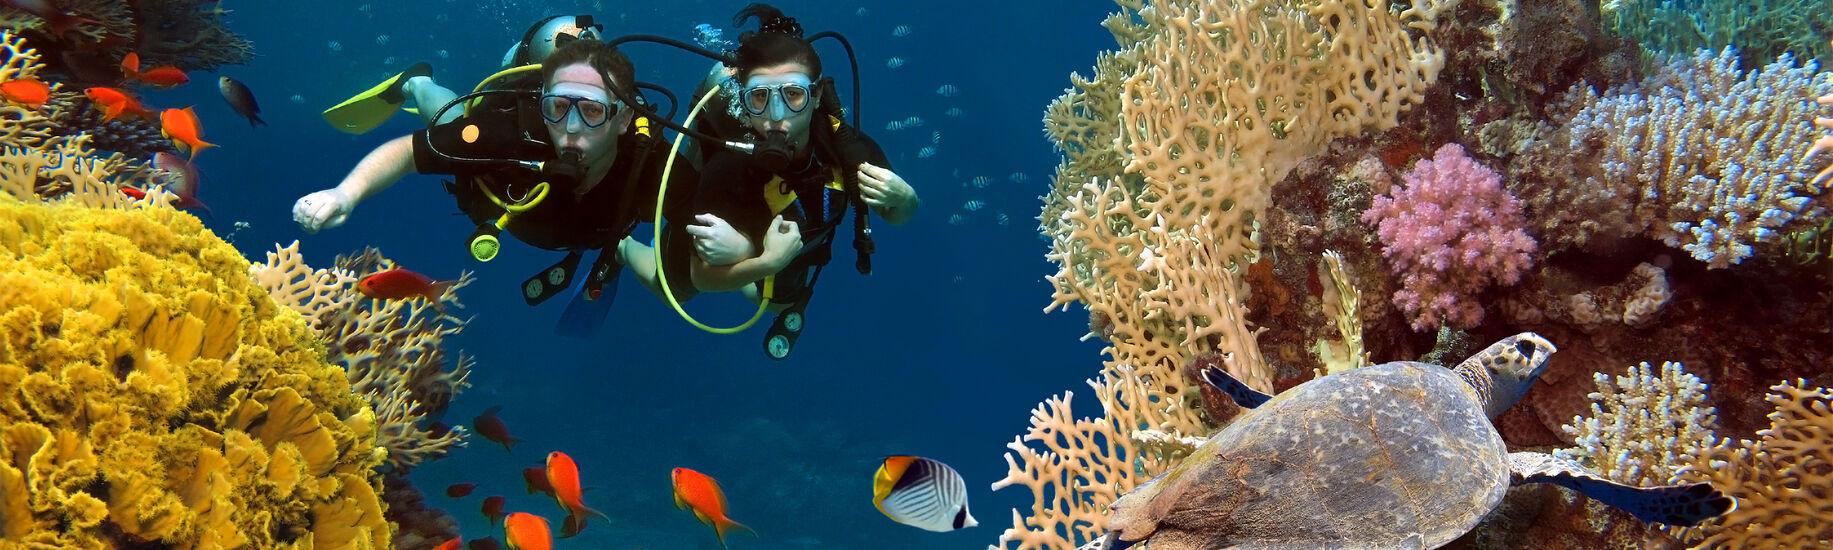 Indian Ocean Diving